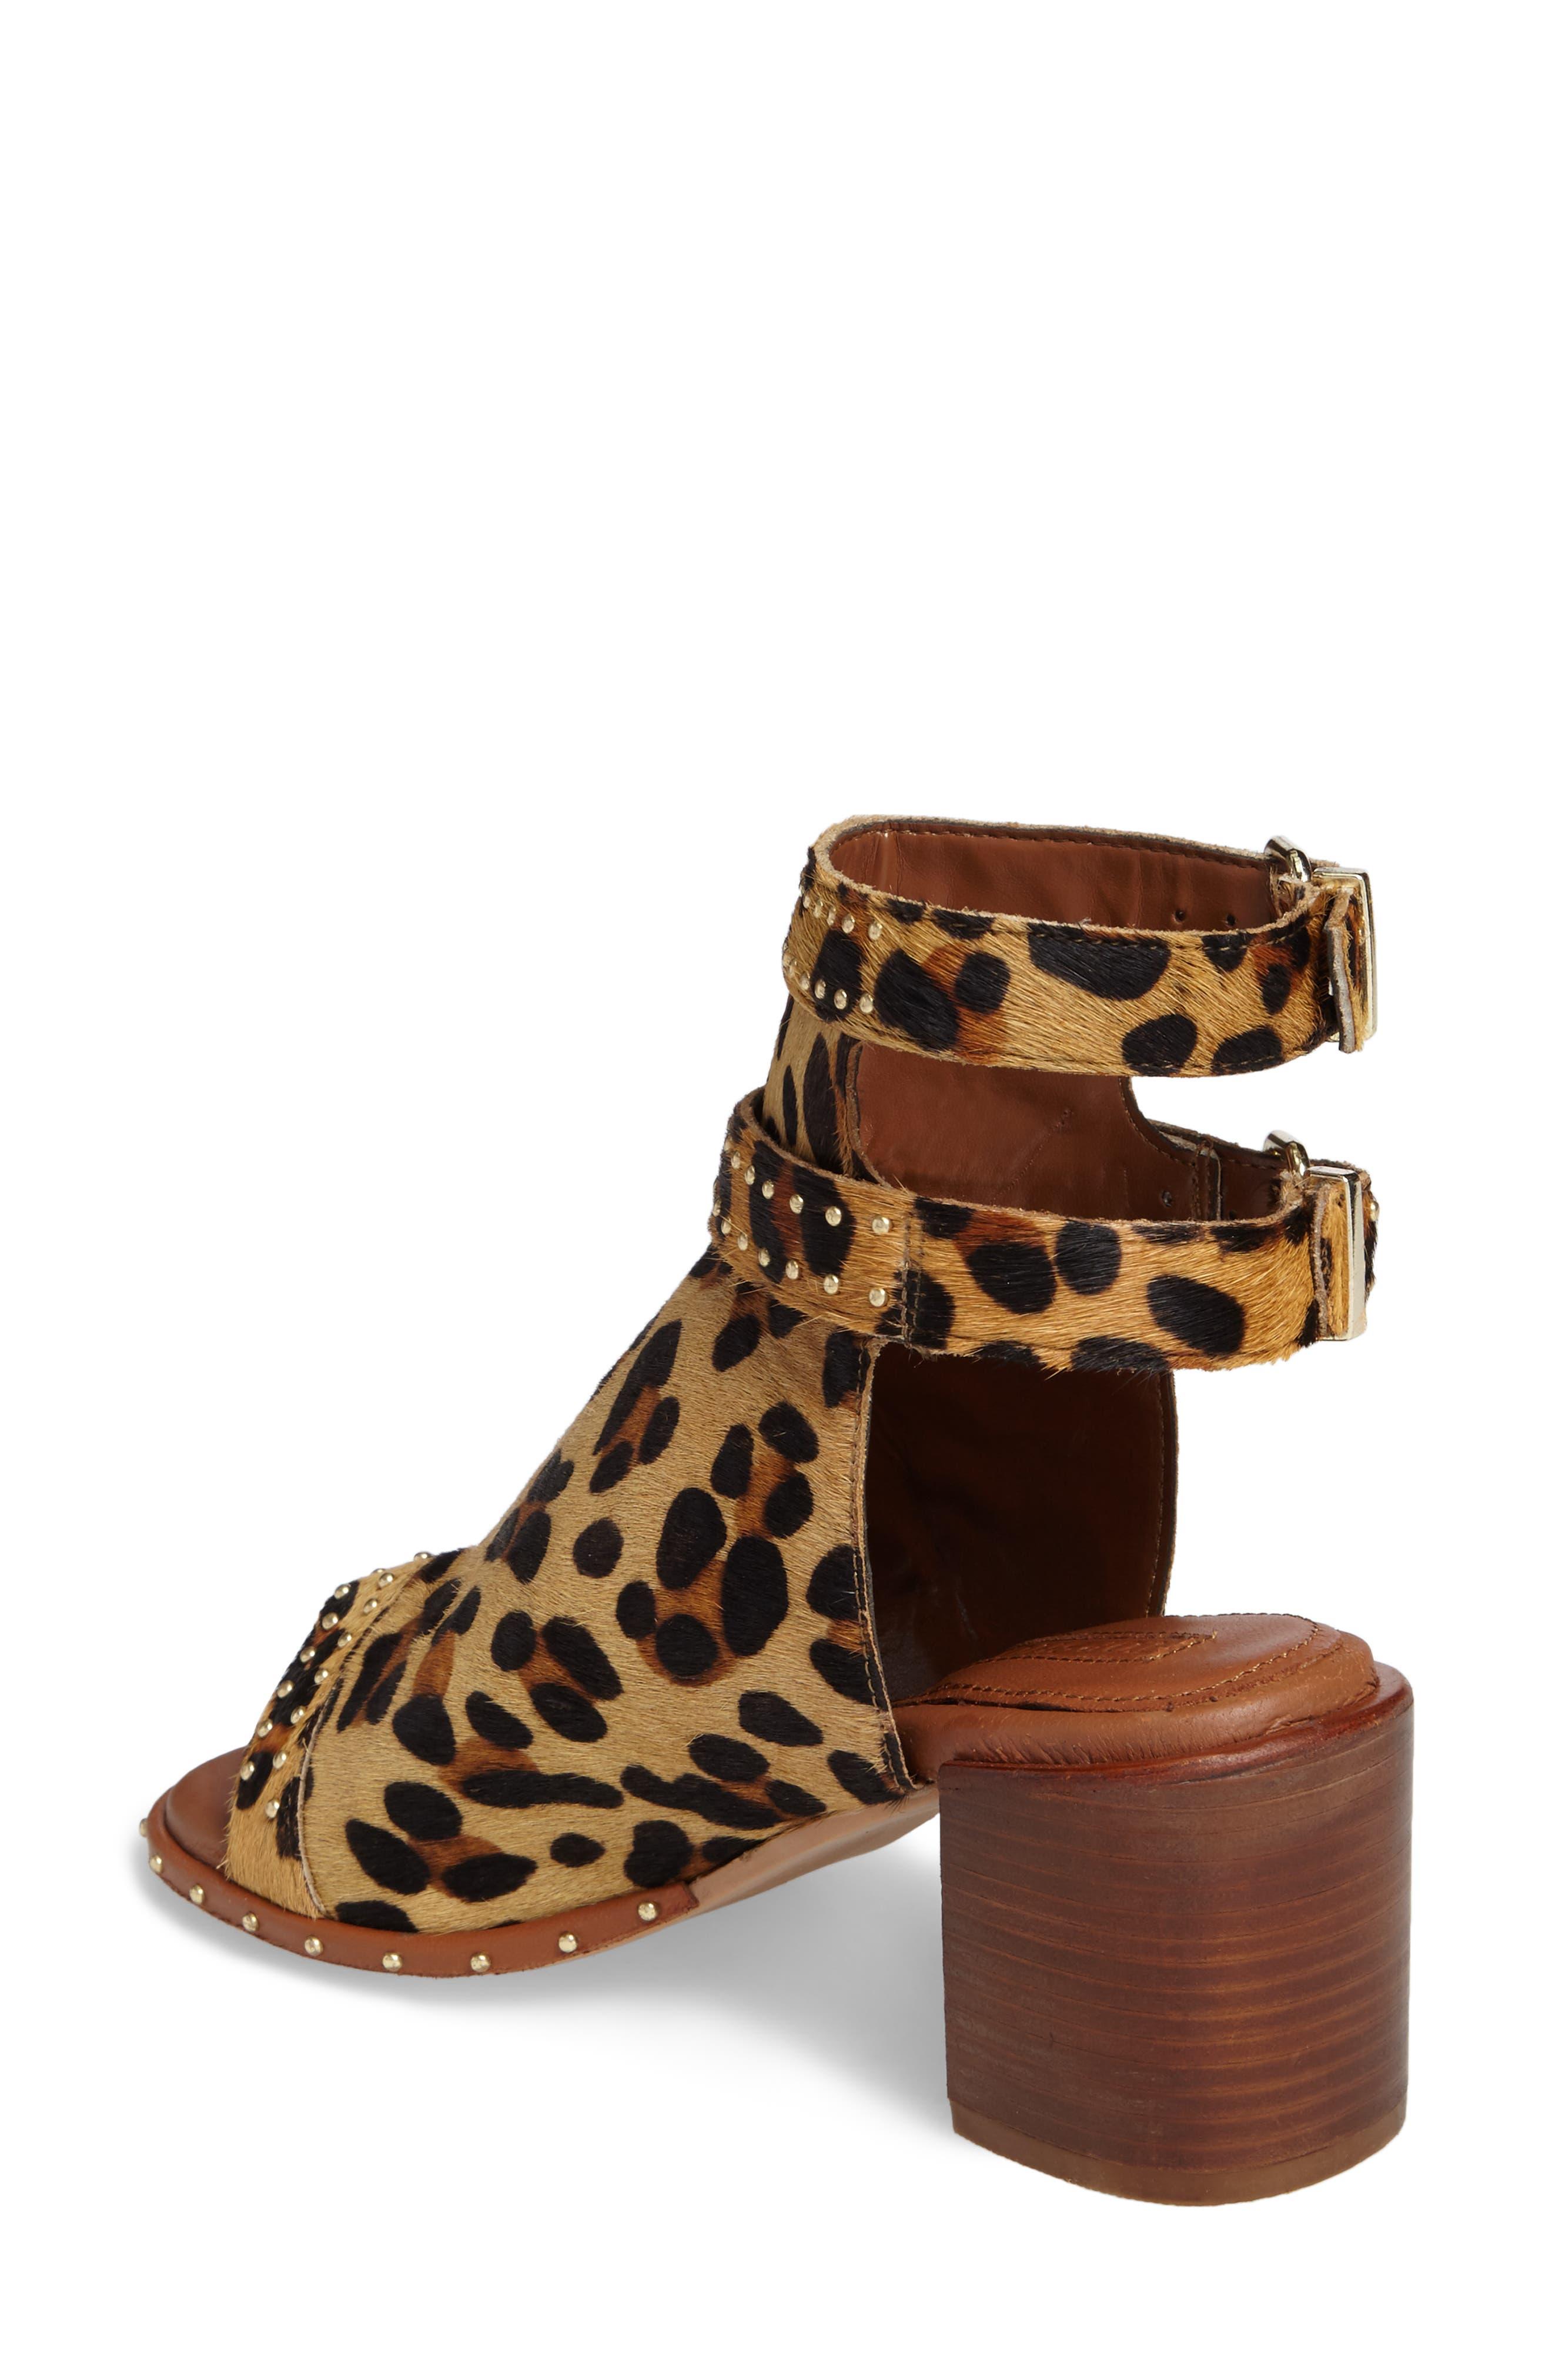 North Studded Bootie Sandal,                             Alternate thumbnail 2, color,                             Leopard